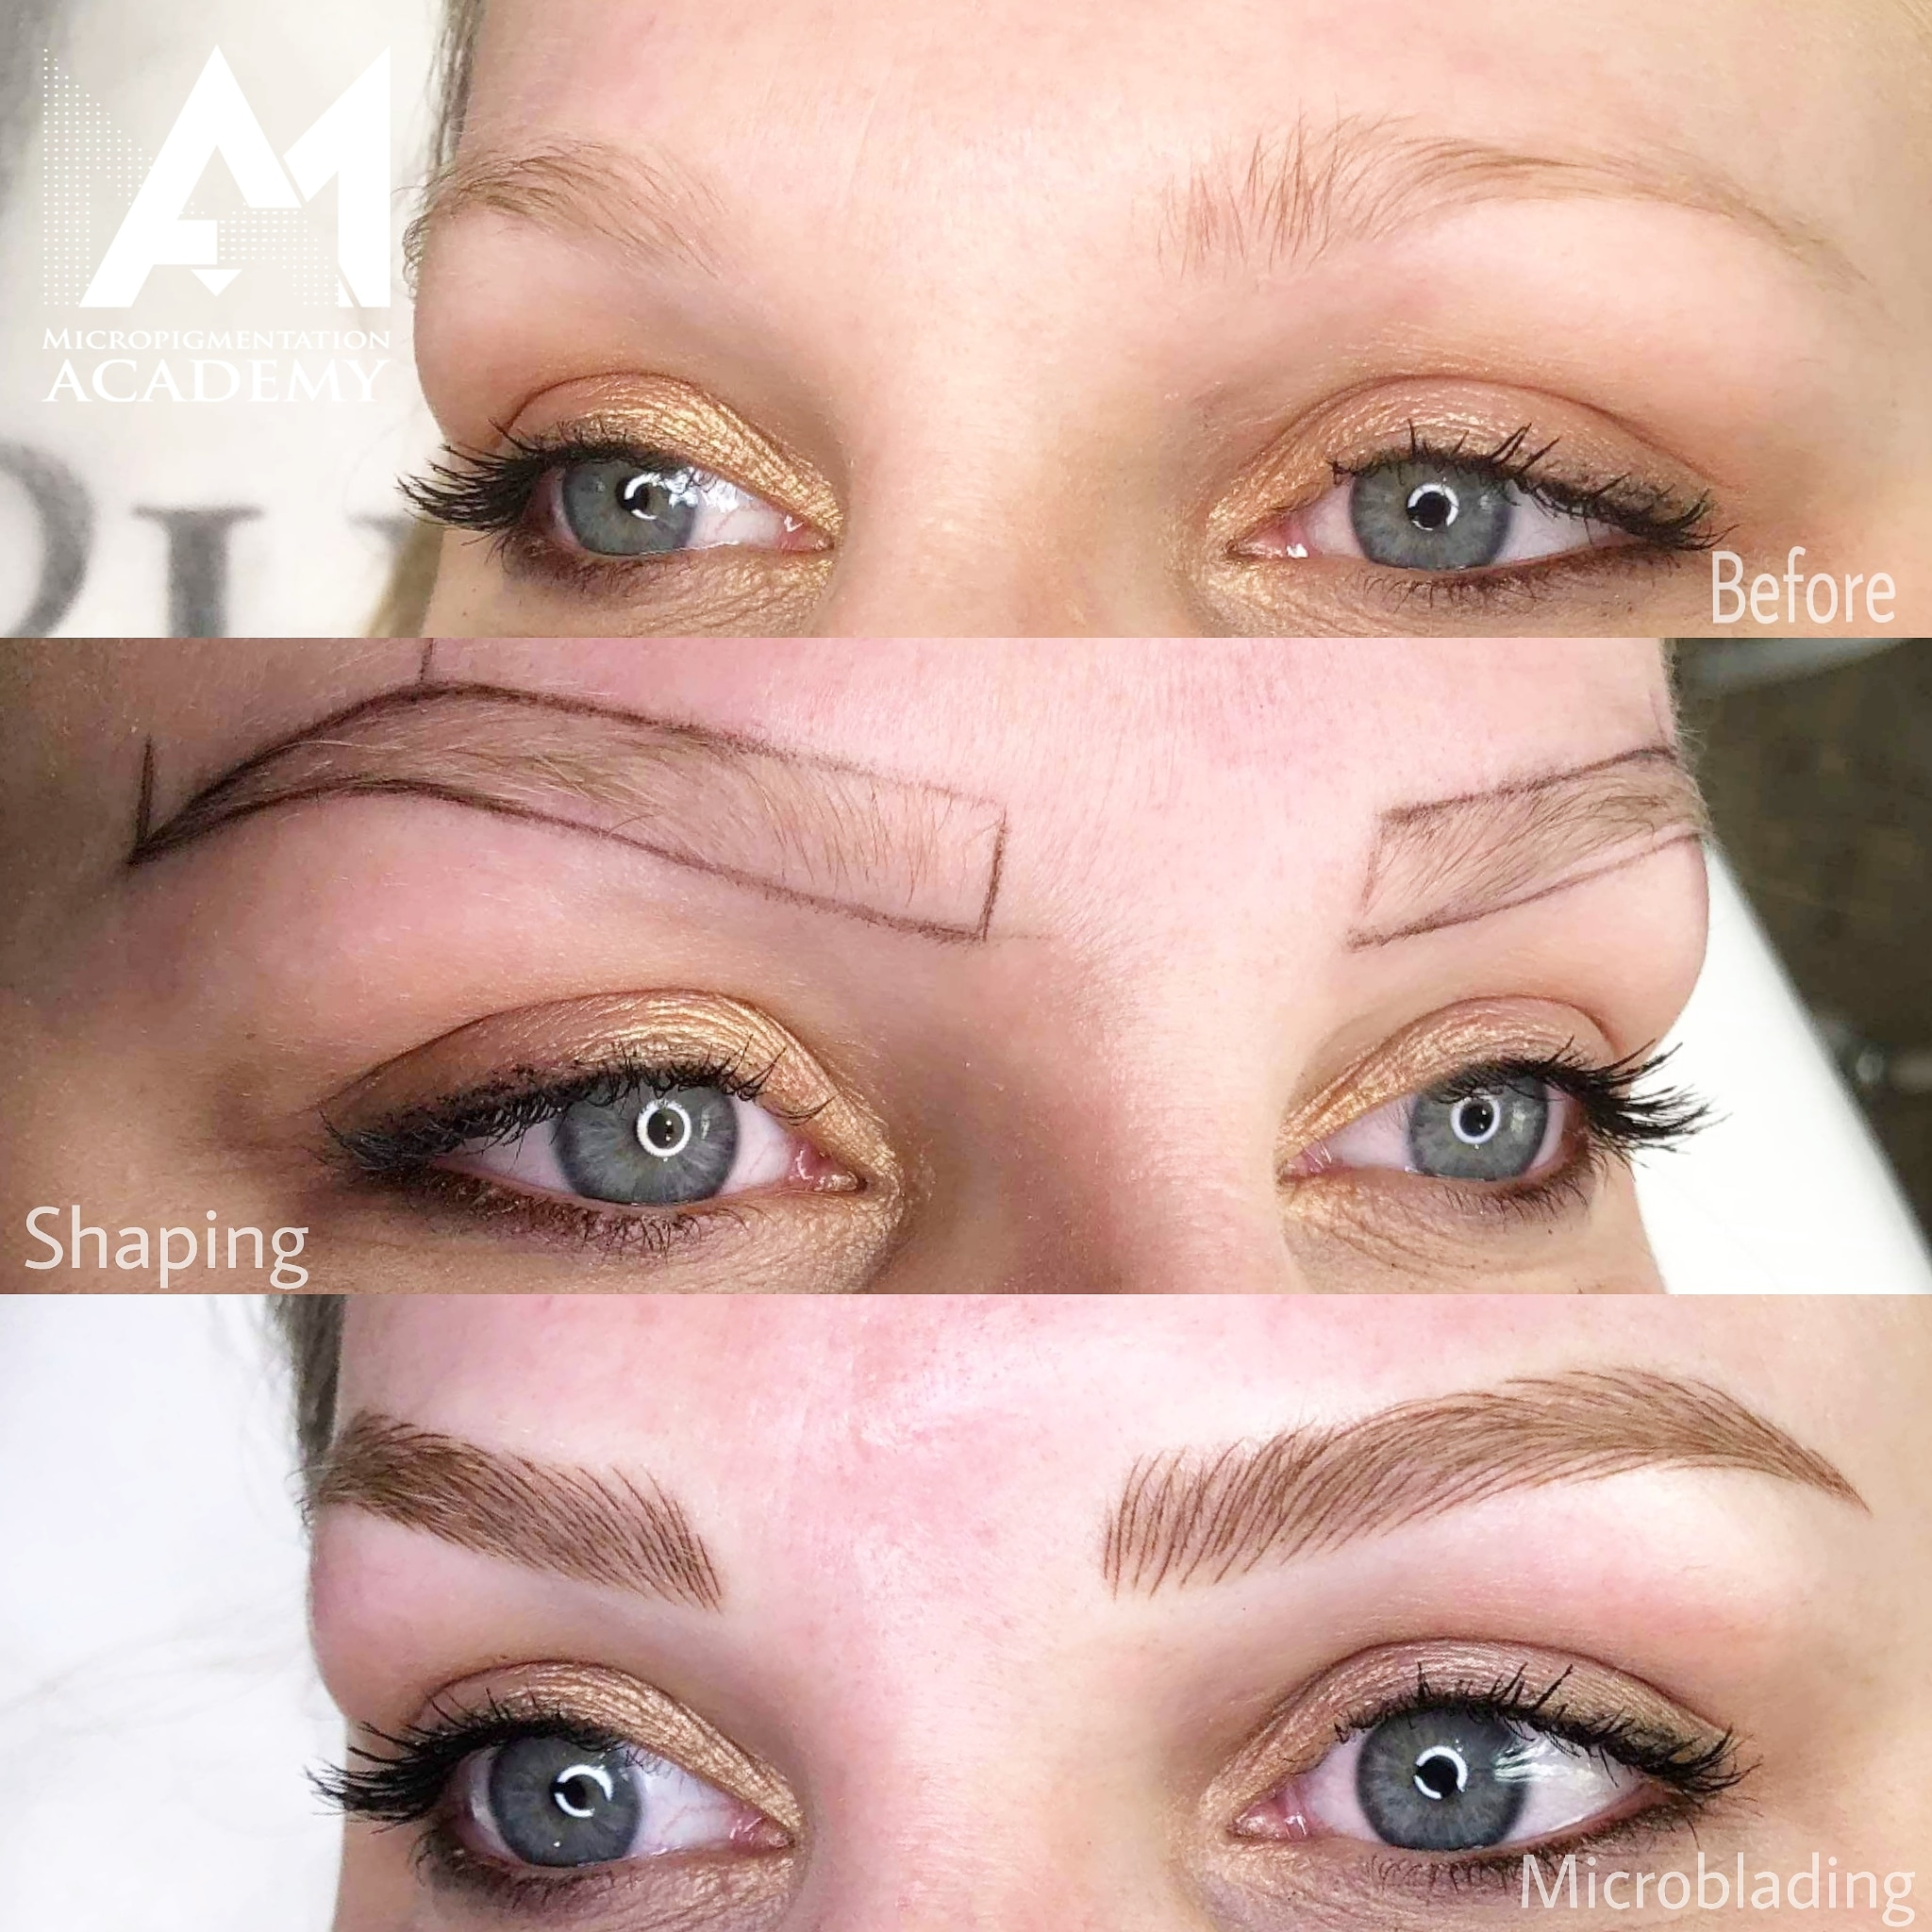 Micropigmentation Academy (Microblading- Scalp Tattoo Treatment/Training) Connecticut image 0